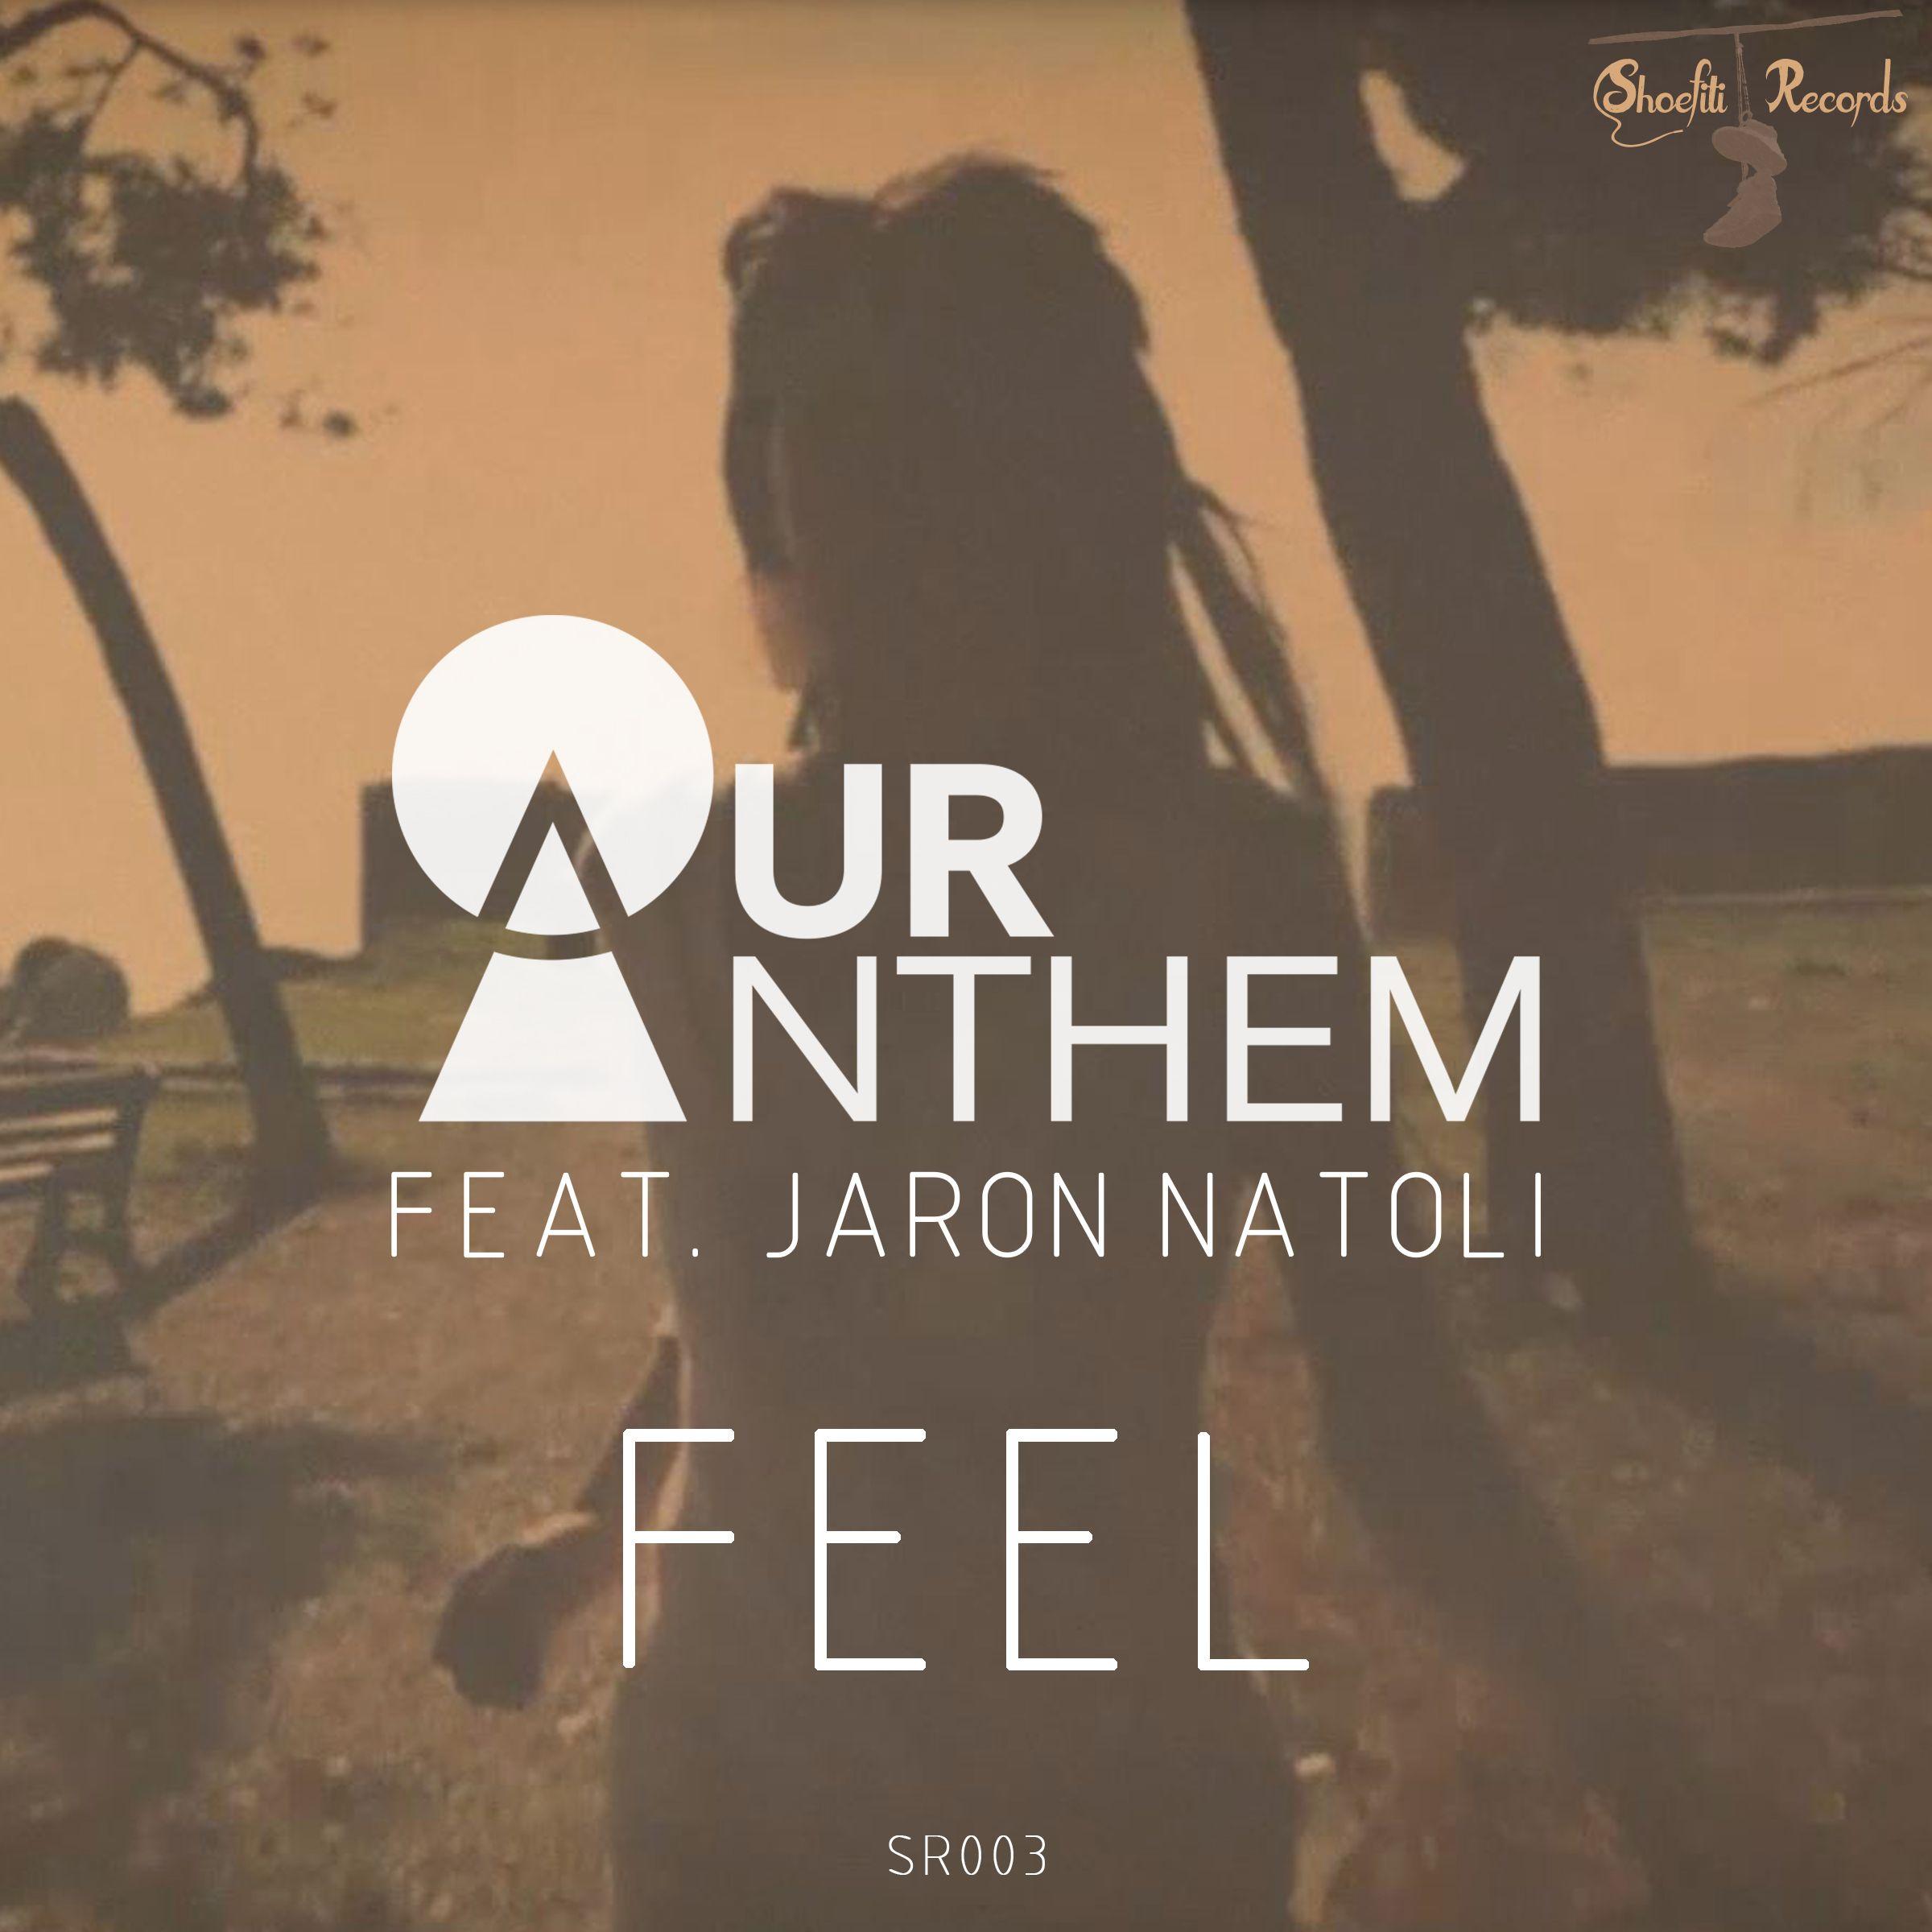 artwork_our_anthem_feat._jaron_natoli_-_feel.jpg